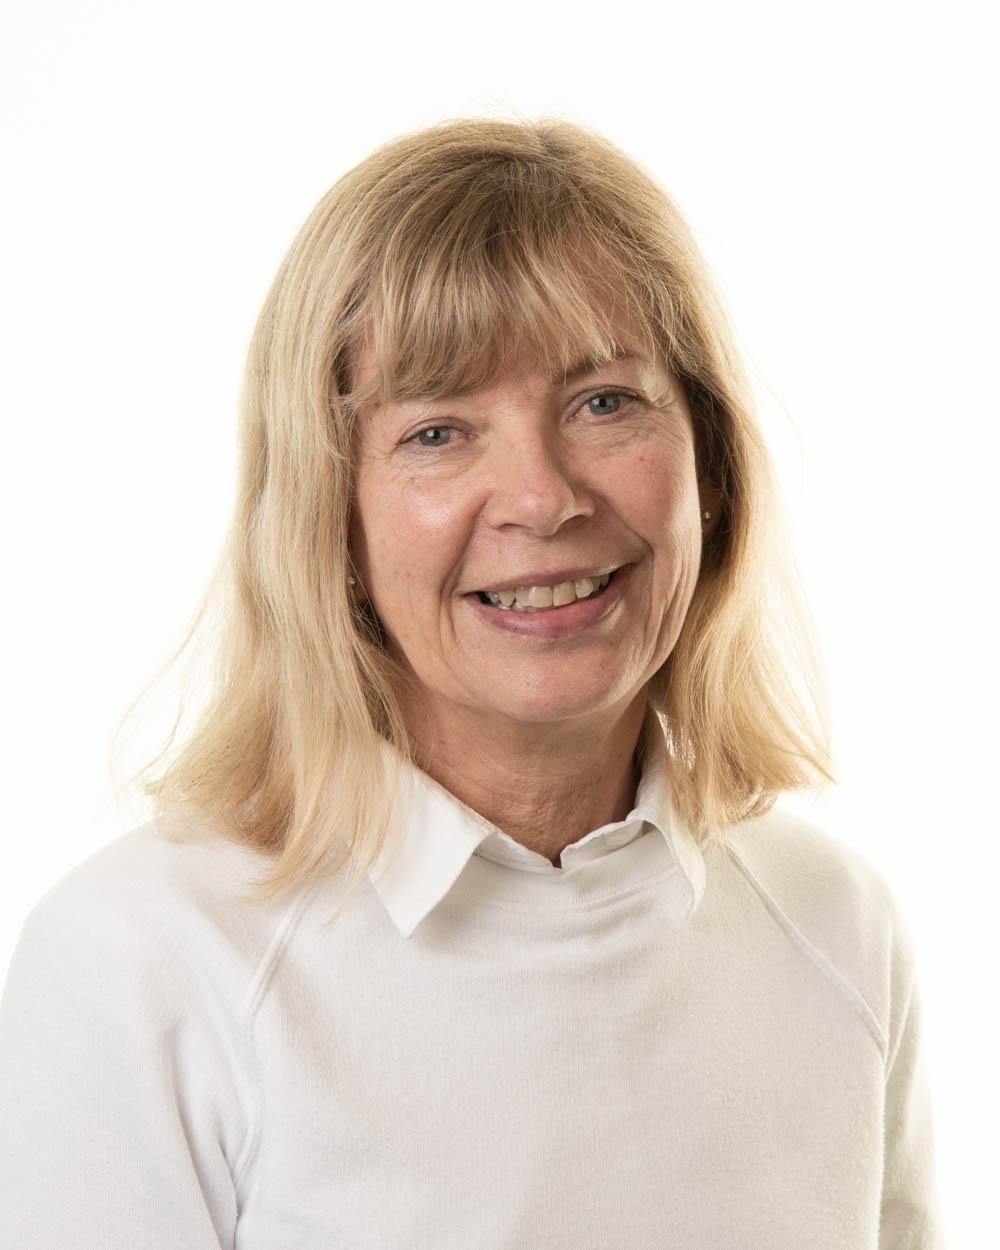 Maria Jonsson